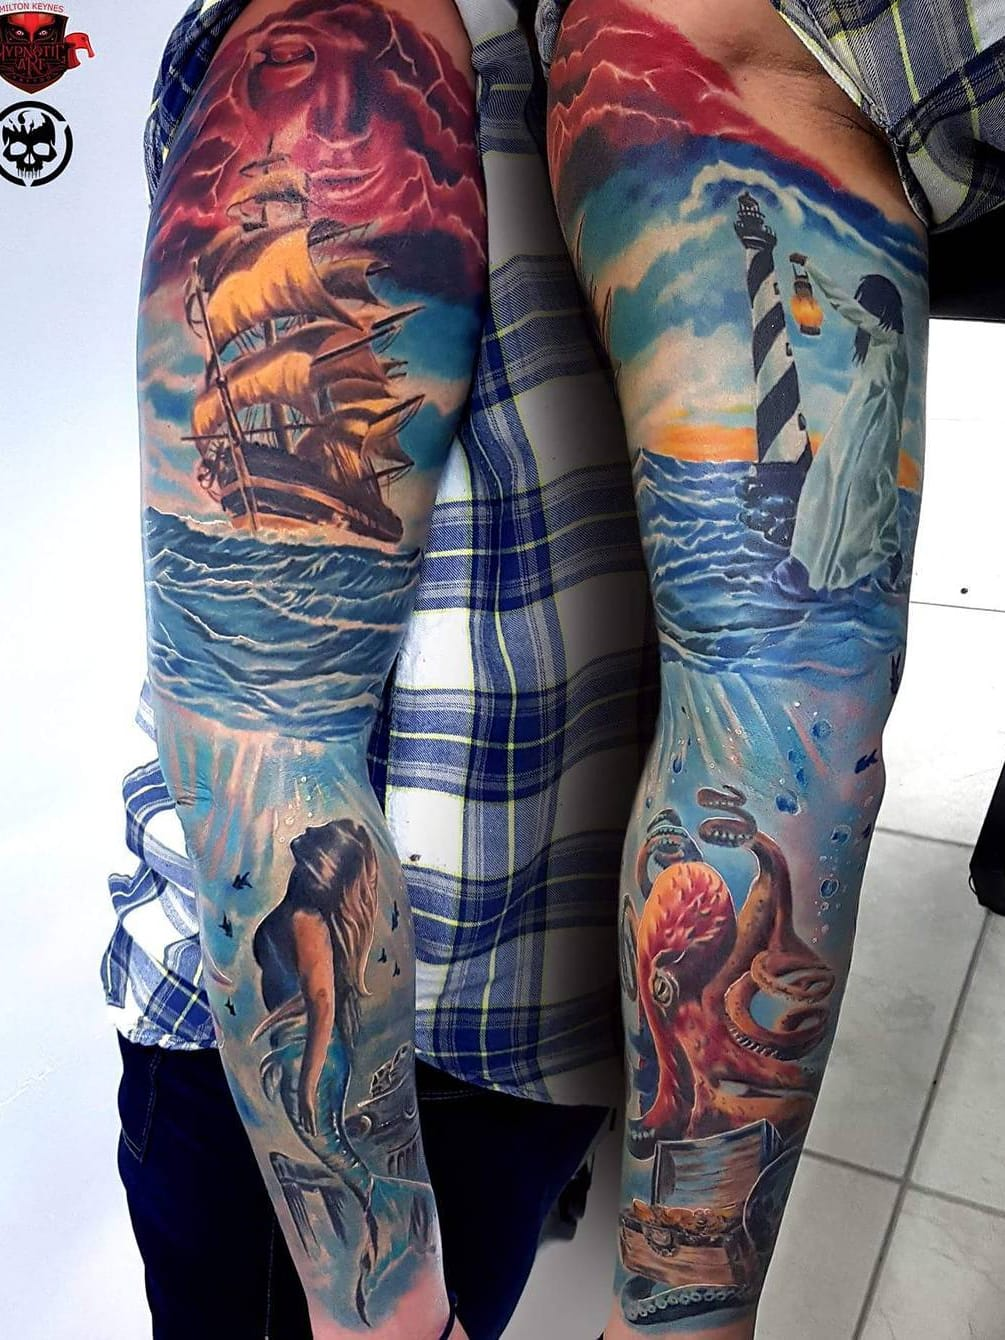 #MarekHaras #gringo #realismo #realism #realismocolorido #colorido #colorful #sereia #mermaid #polvo #octopus #mar #ocean #sea #navio #ship #farol #lighthouse #woman #mulher